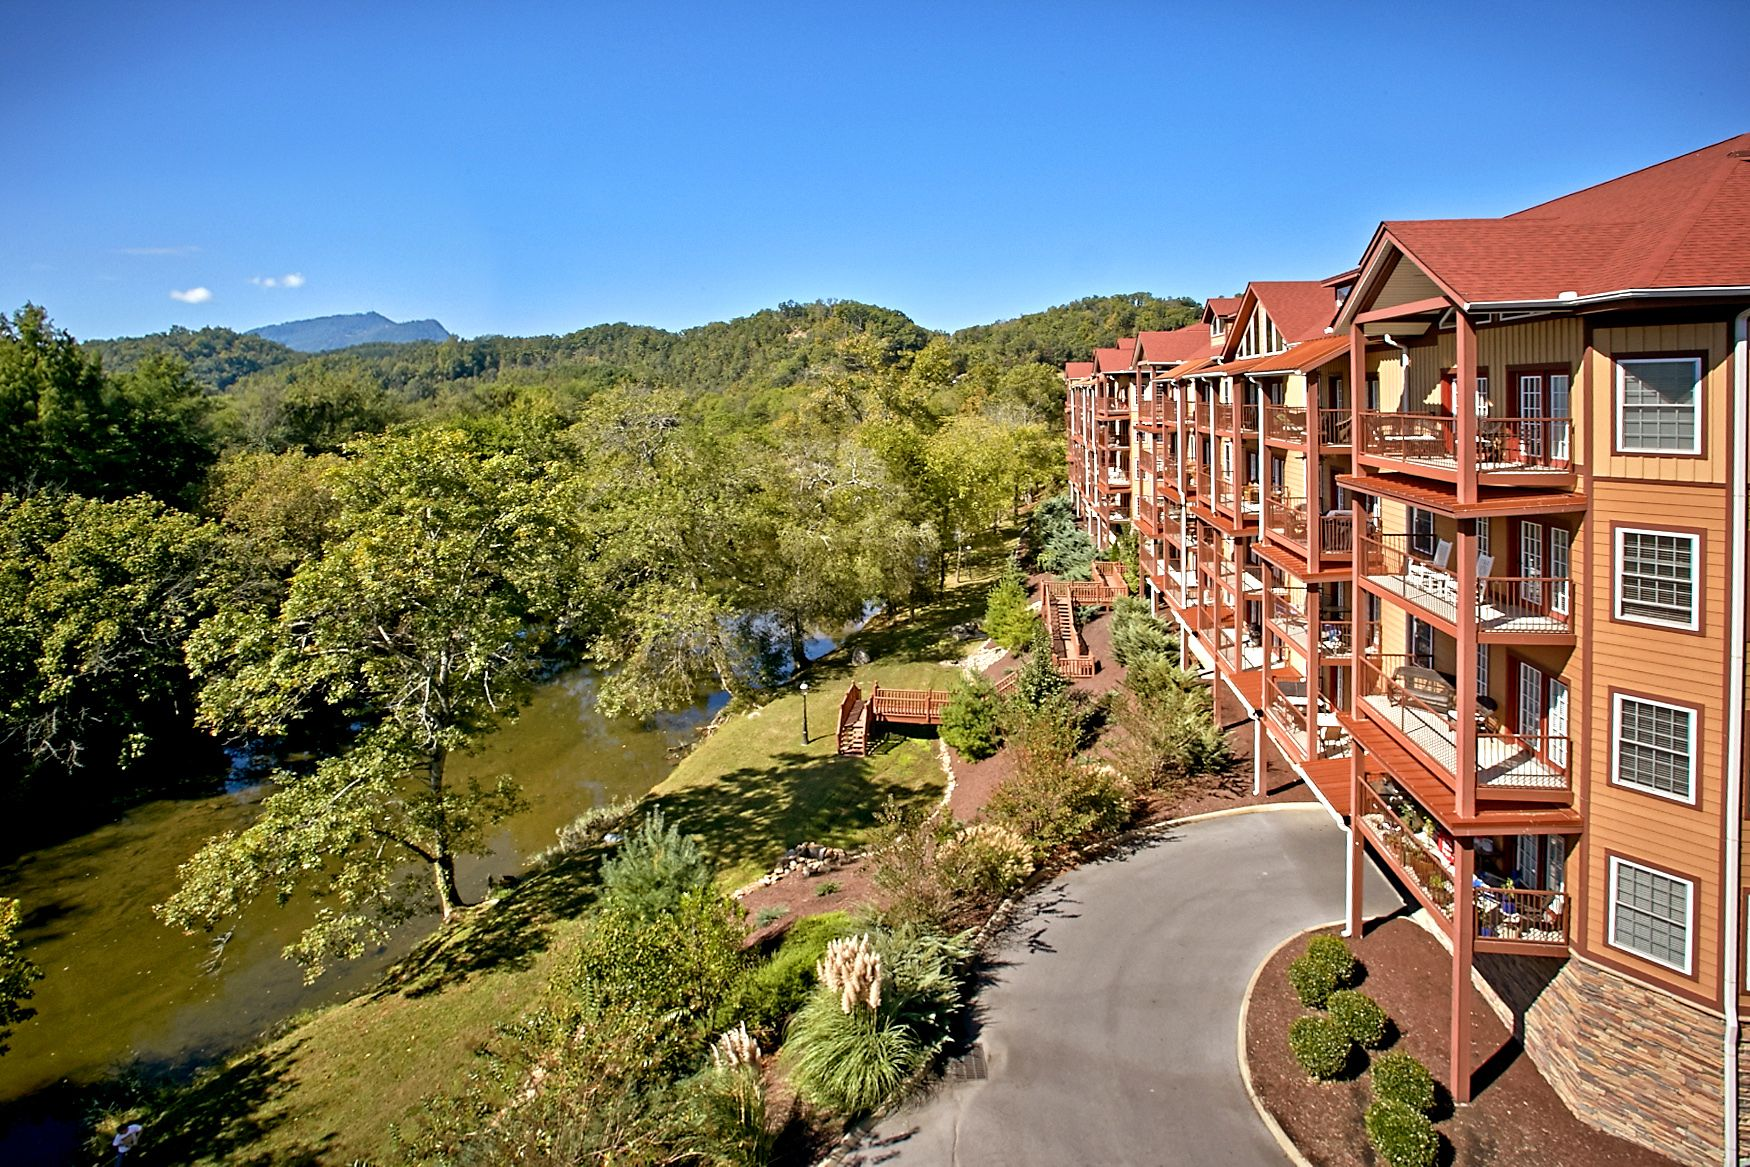 Appleview River Resort in Sevierville, TN Resort, Condo